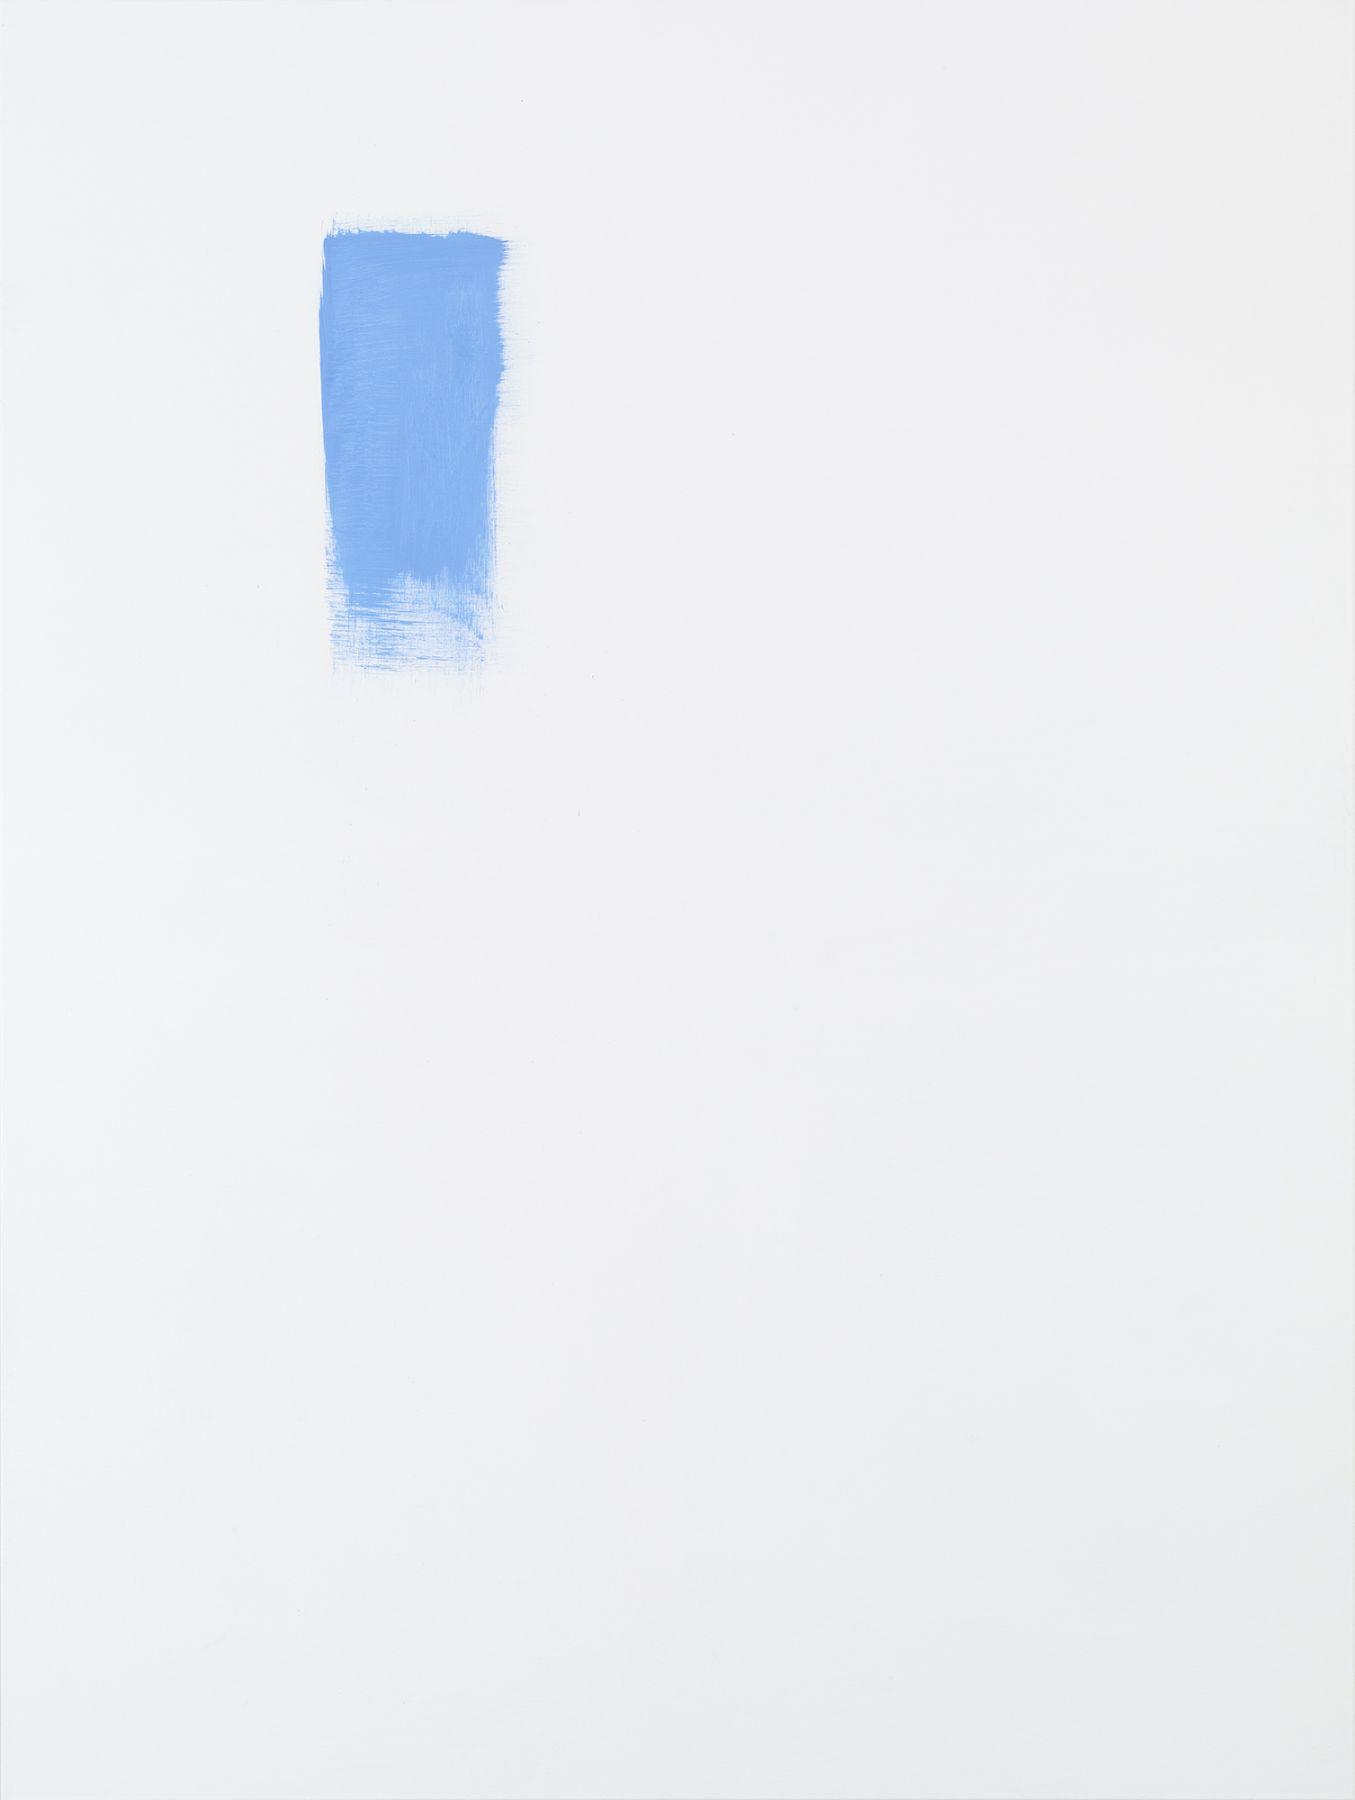 Michael Krebber MK.289, 2015 Acrylic on canvas  78 3/4 x 59 1/8 inches (200 x 150.2 cm)